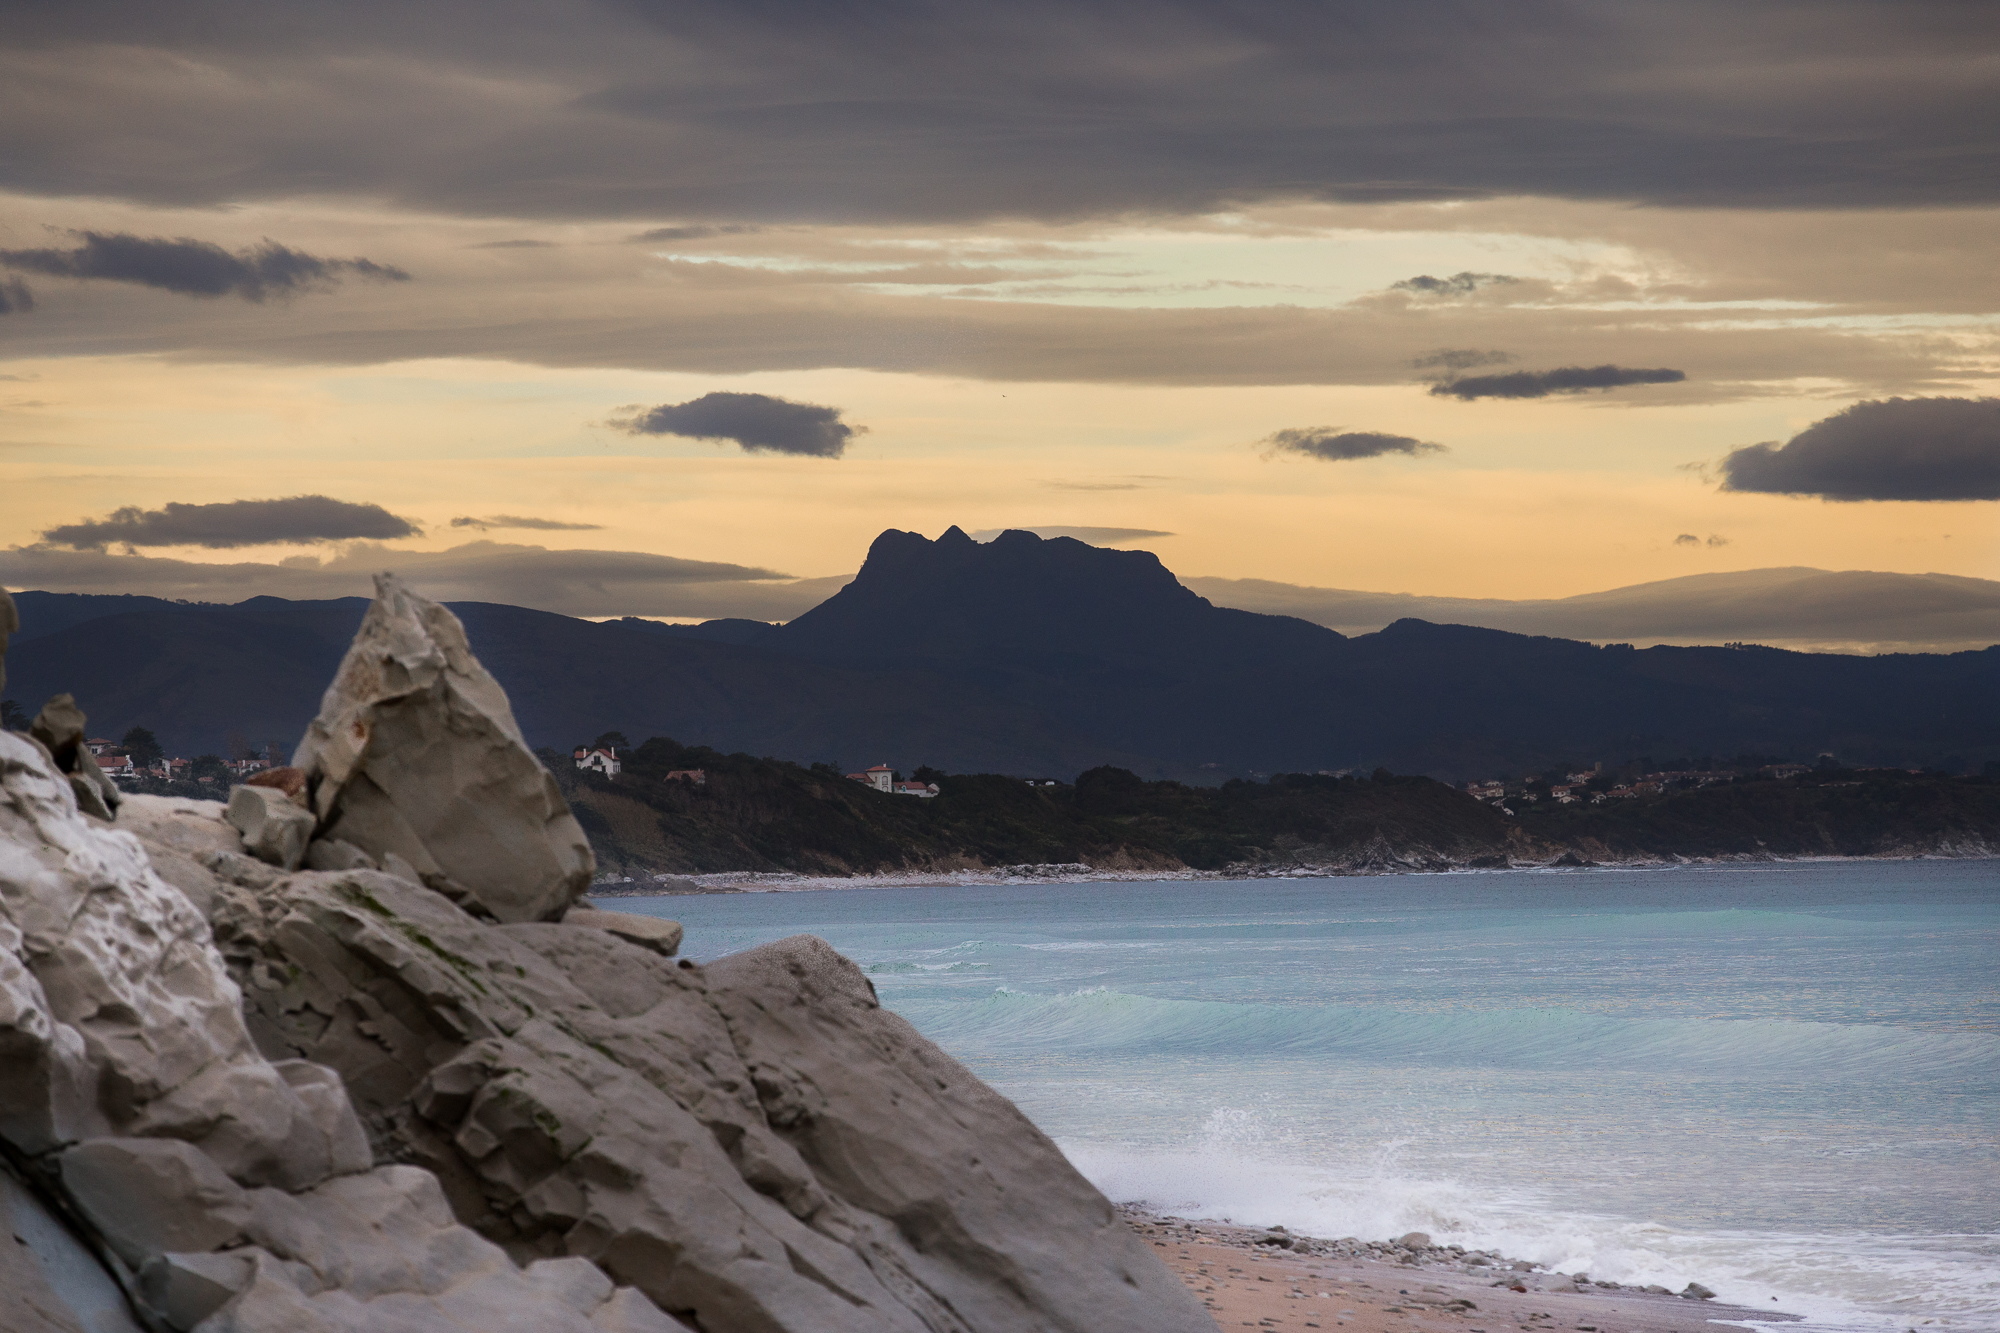 Nature mer Cote basque